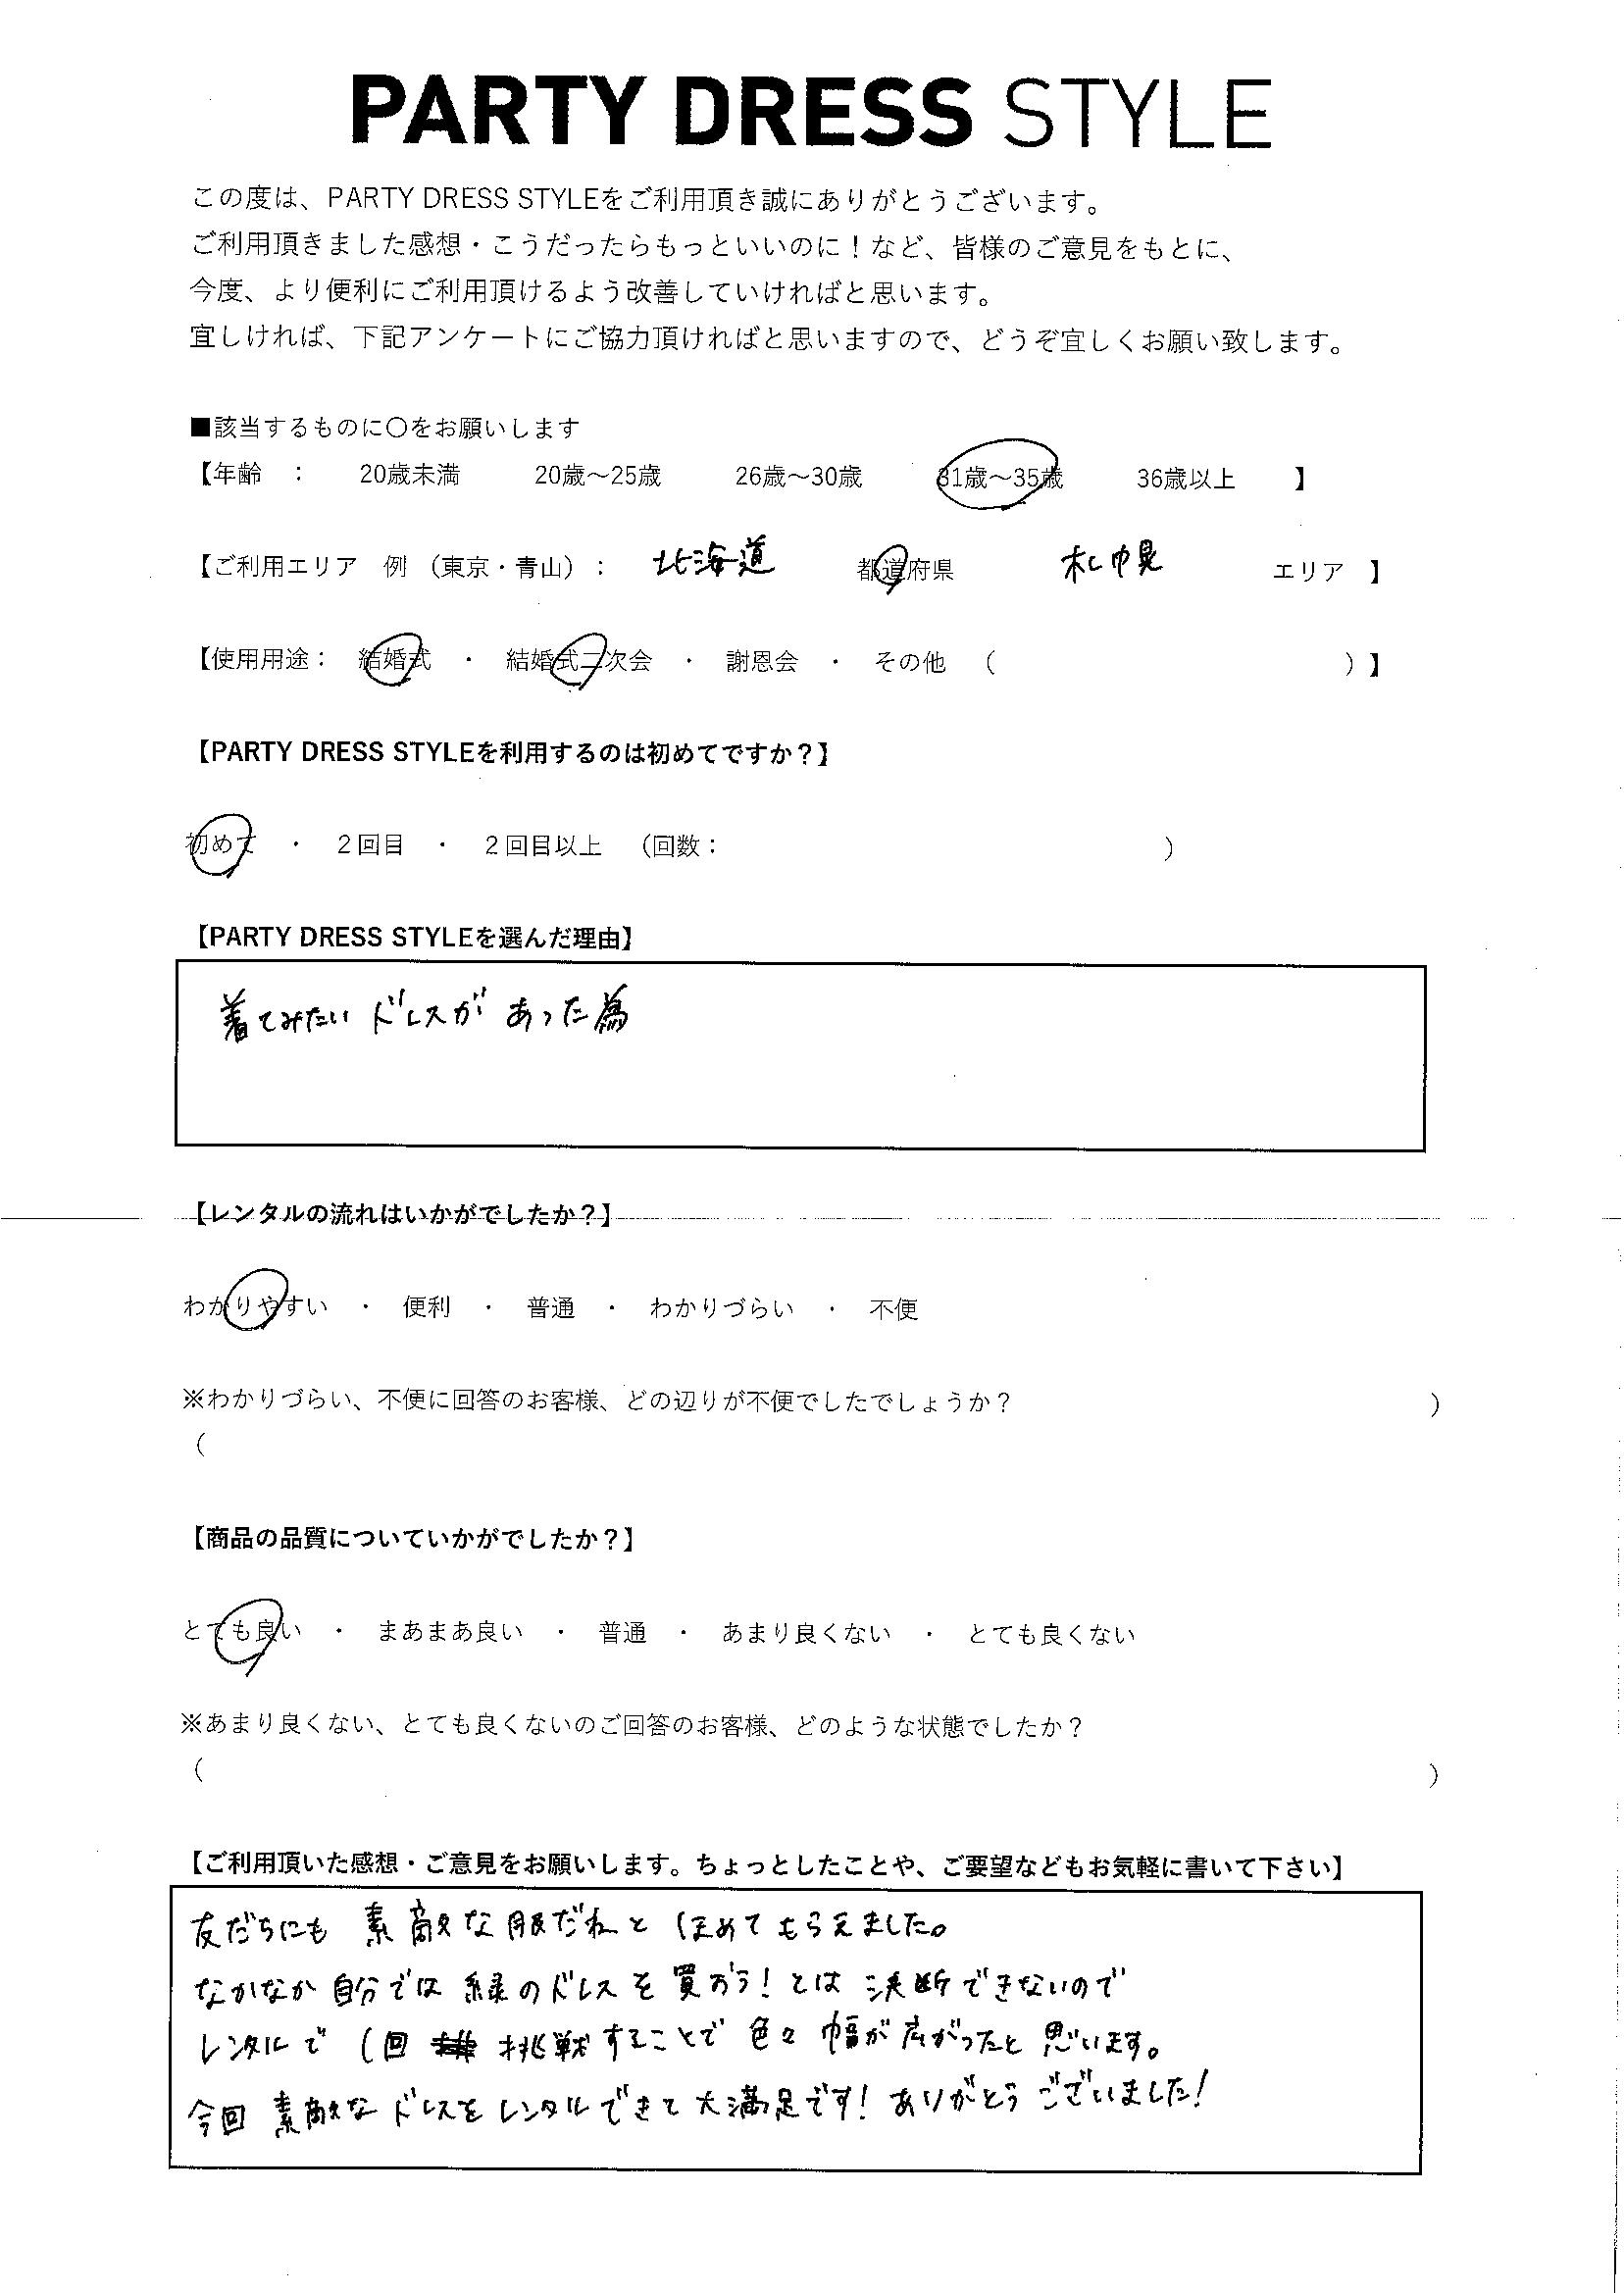 8/17結婚式・二次会 北海道・札幌エリア